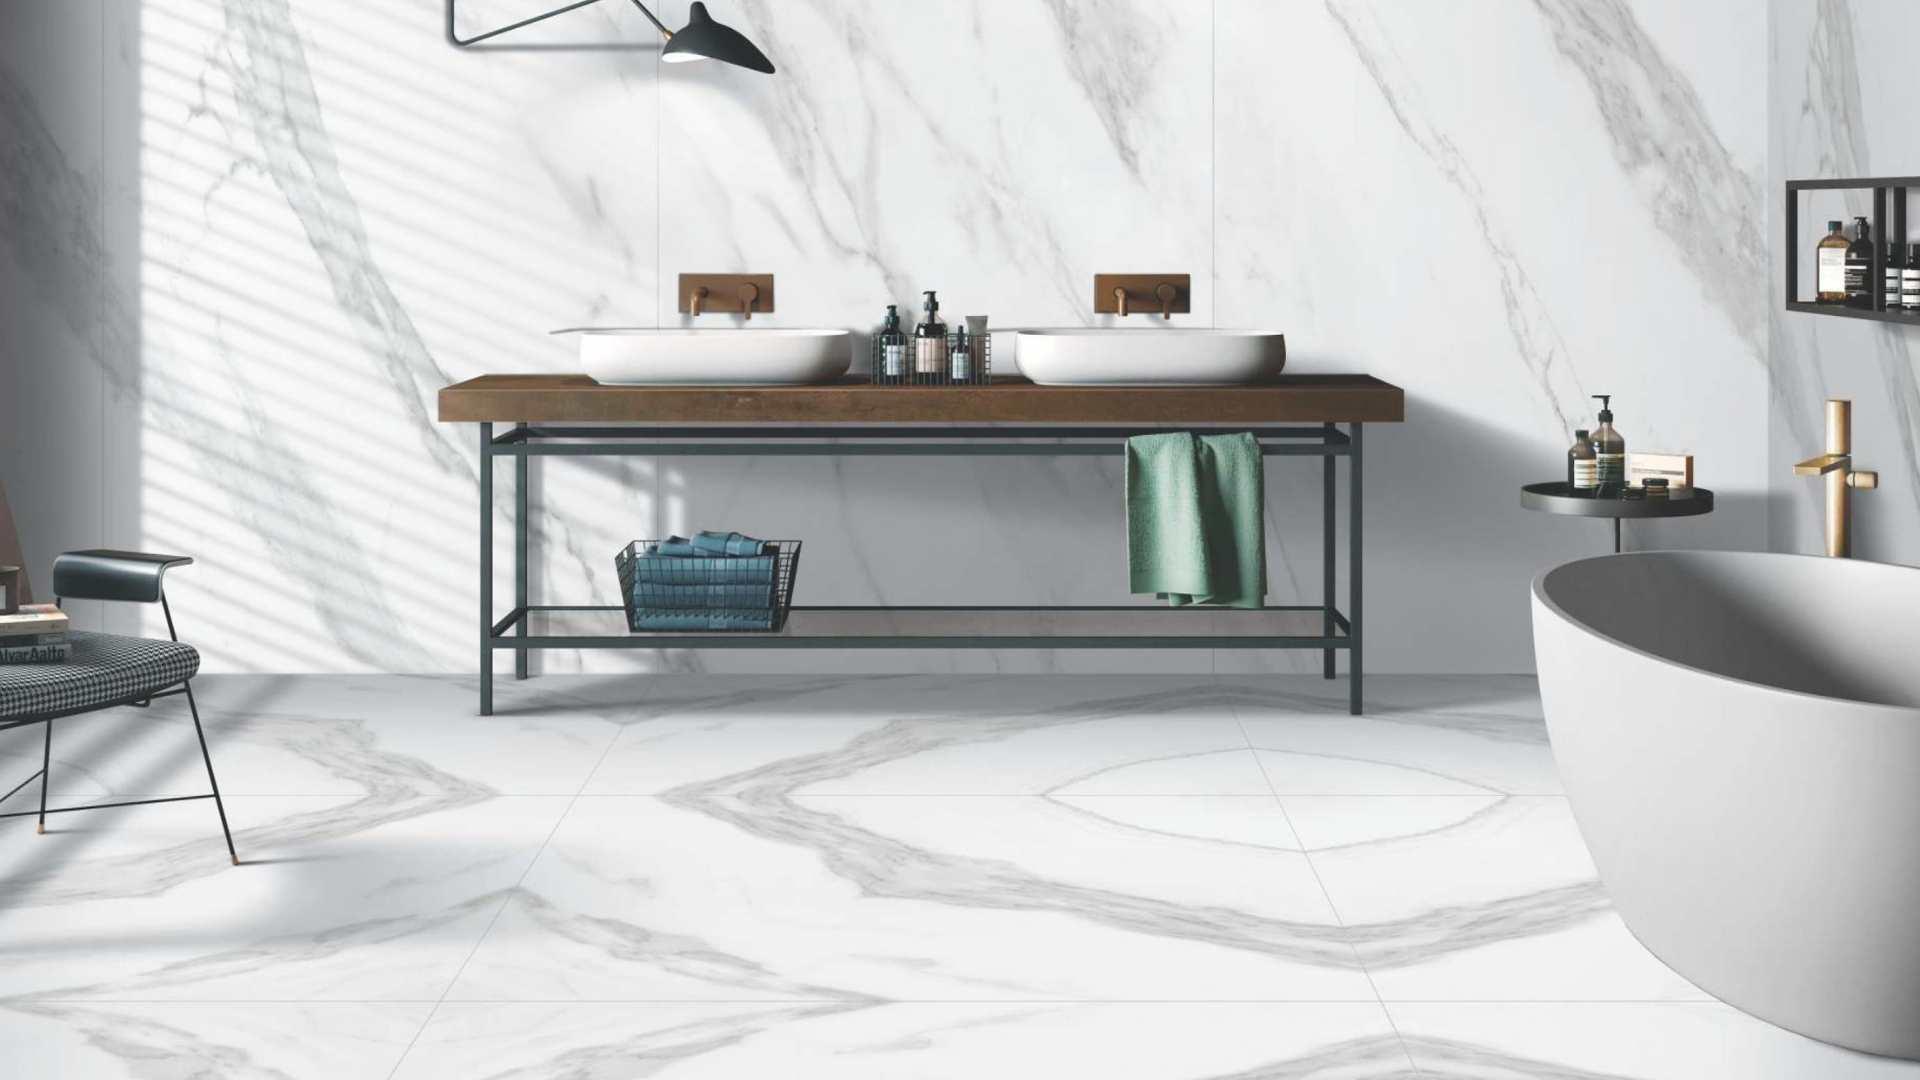 Calacatta-Gris Porcelain Tile